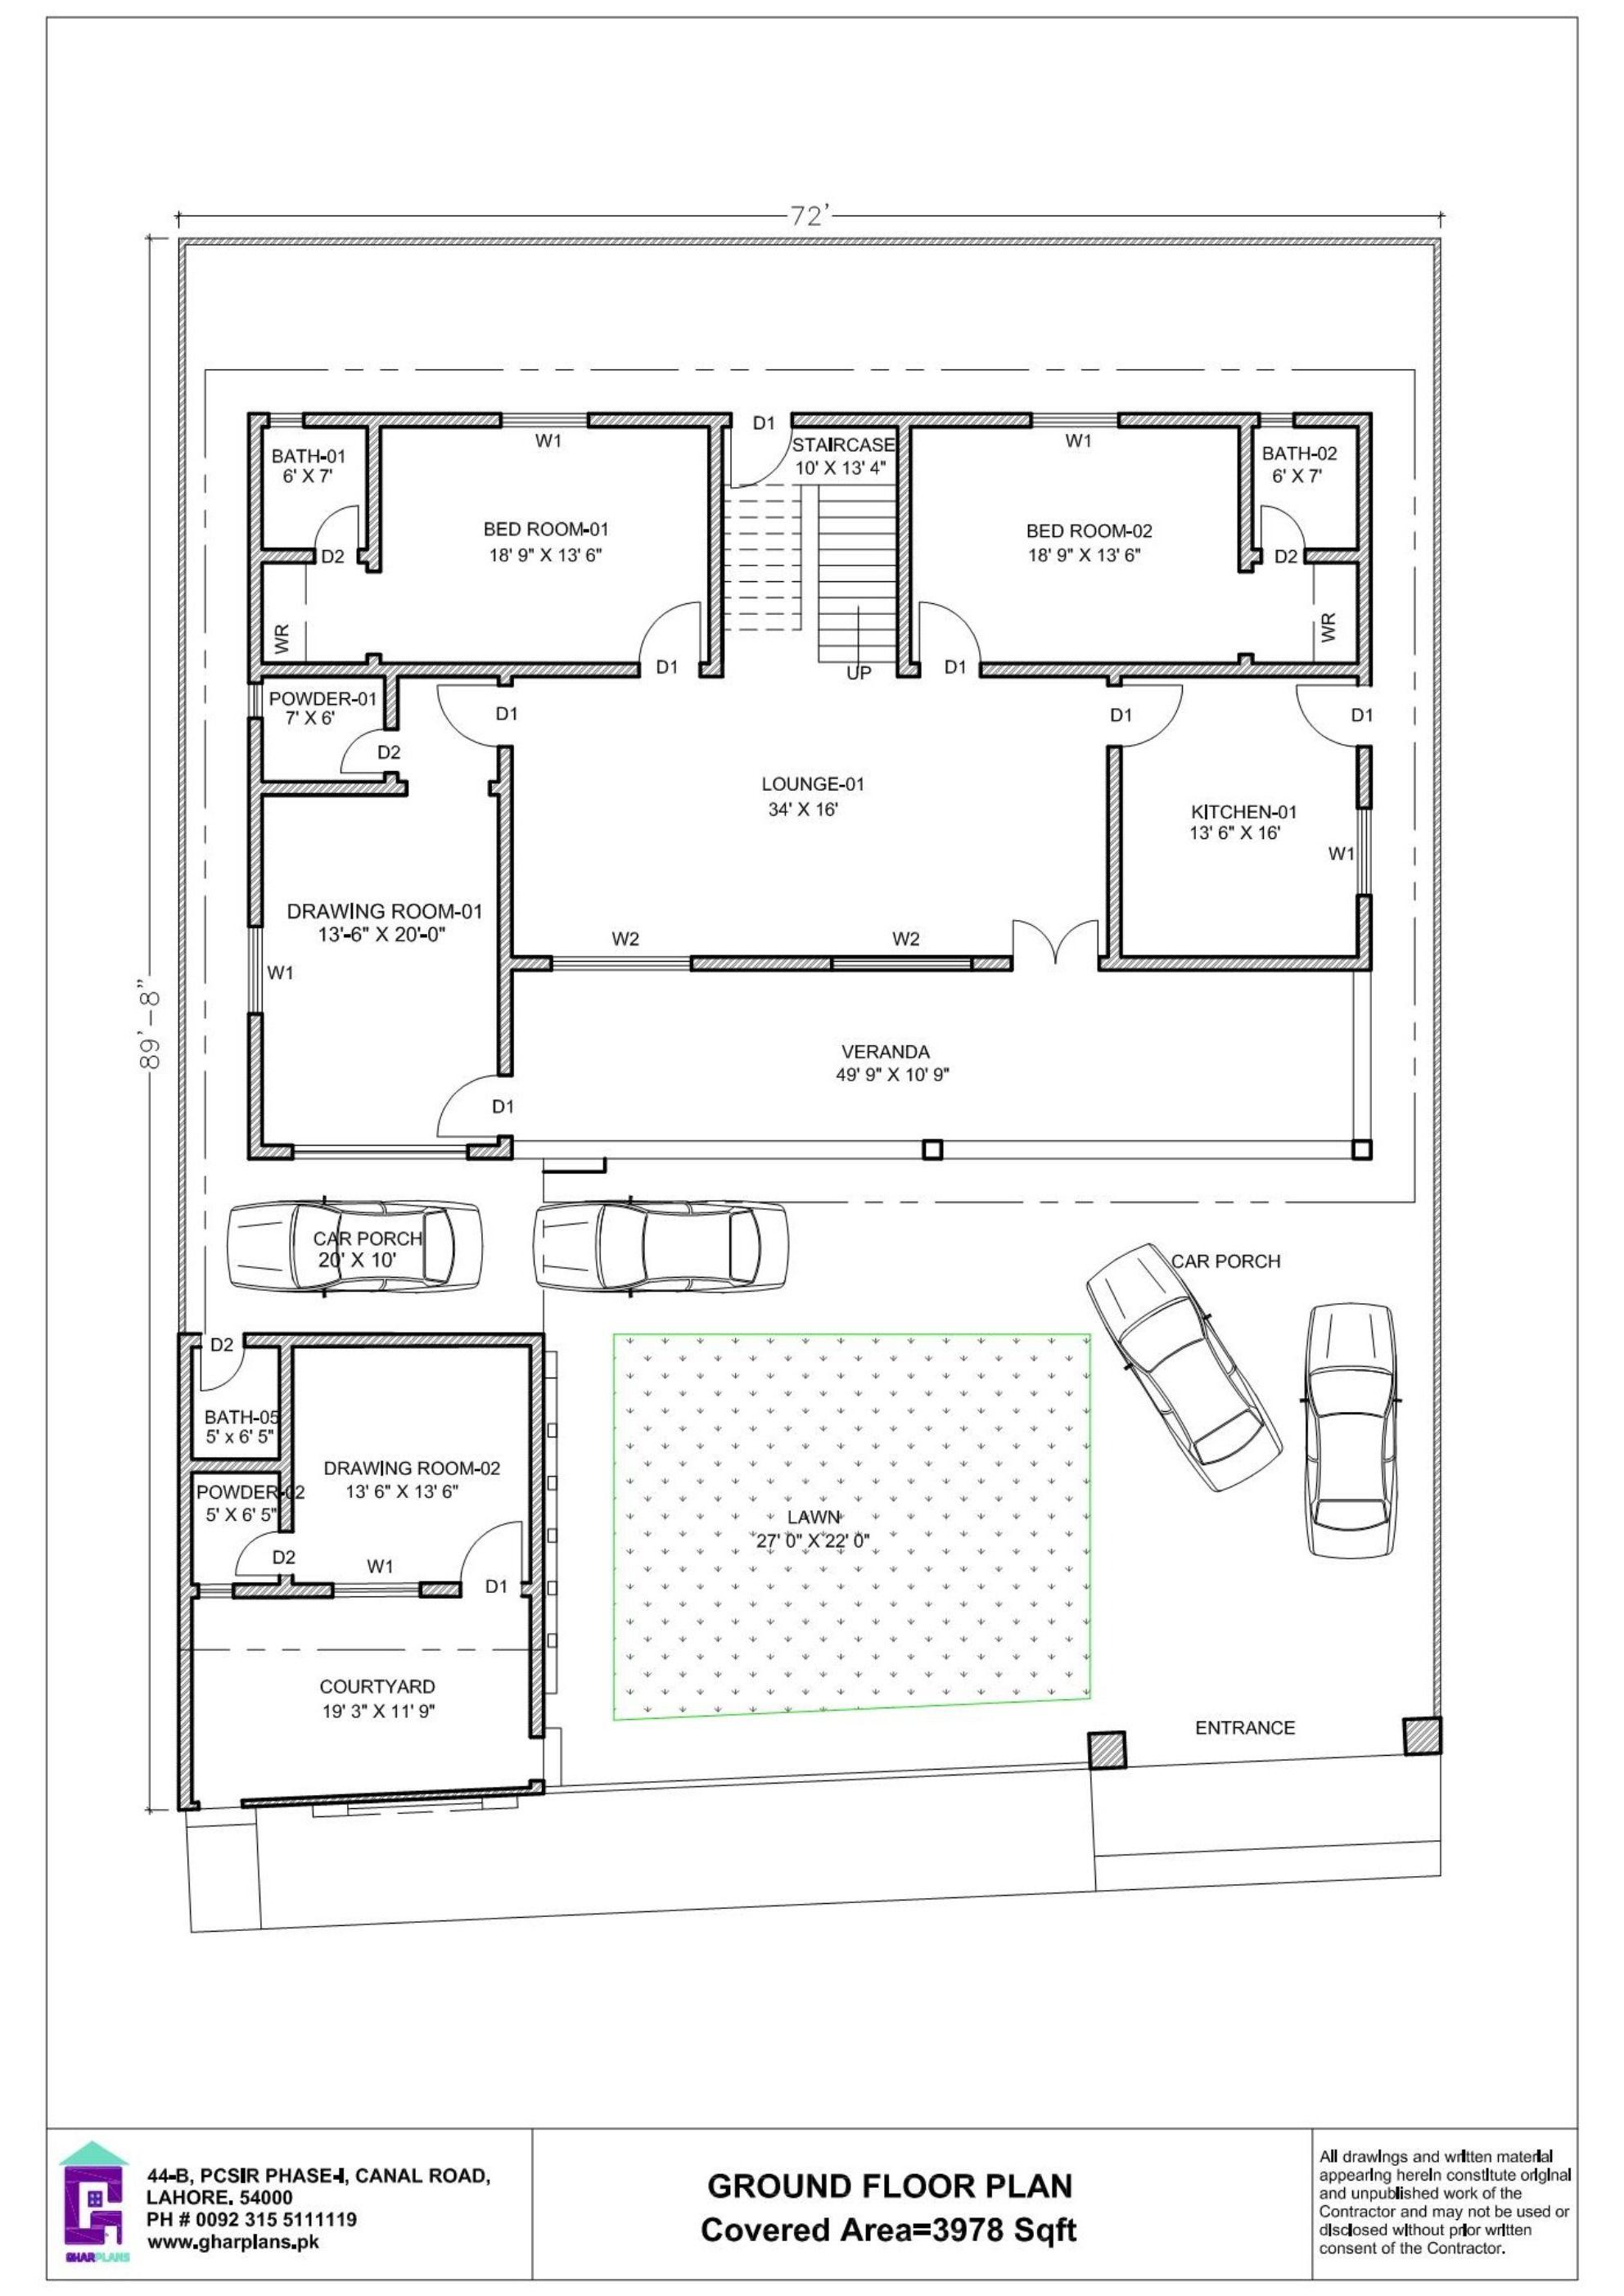 72 X 90 House Plan Design 6 500 Square Feet Ground Floor Plan Square House Plans House Plans Floor Plan Layout